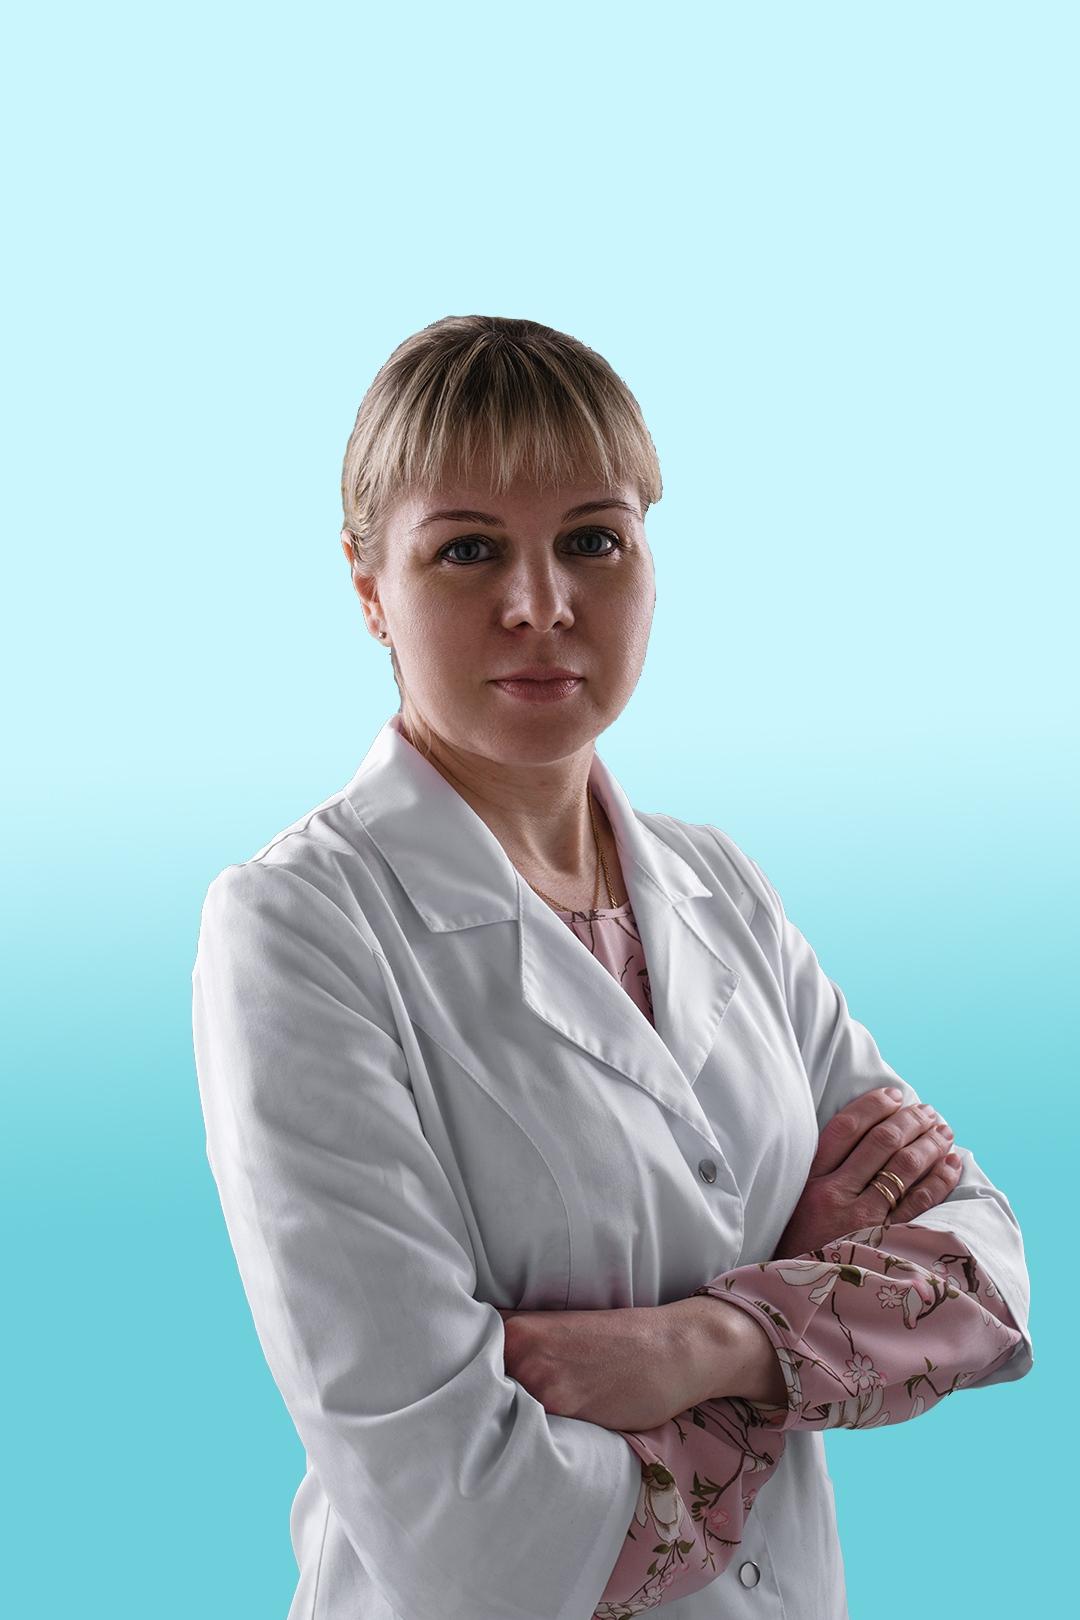 Врач-нейропсихолог Титкова Ирина Игоревна